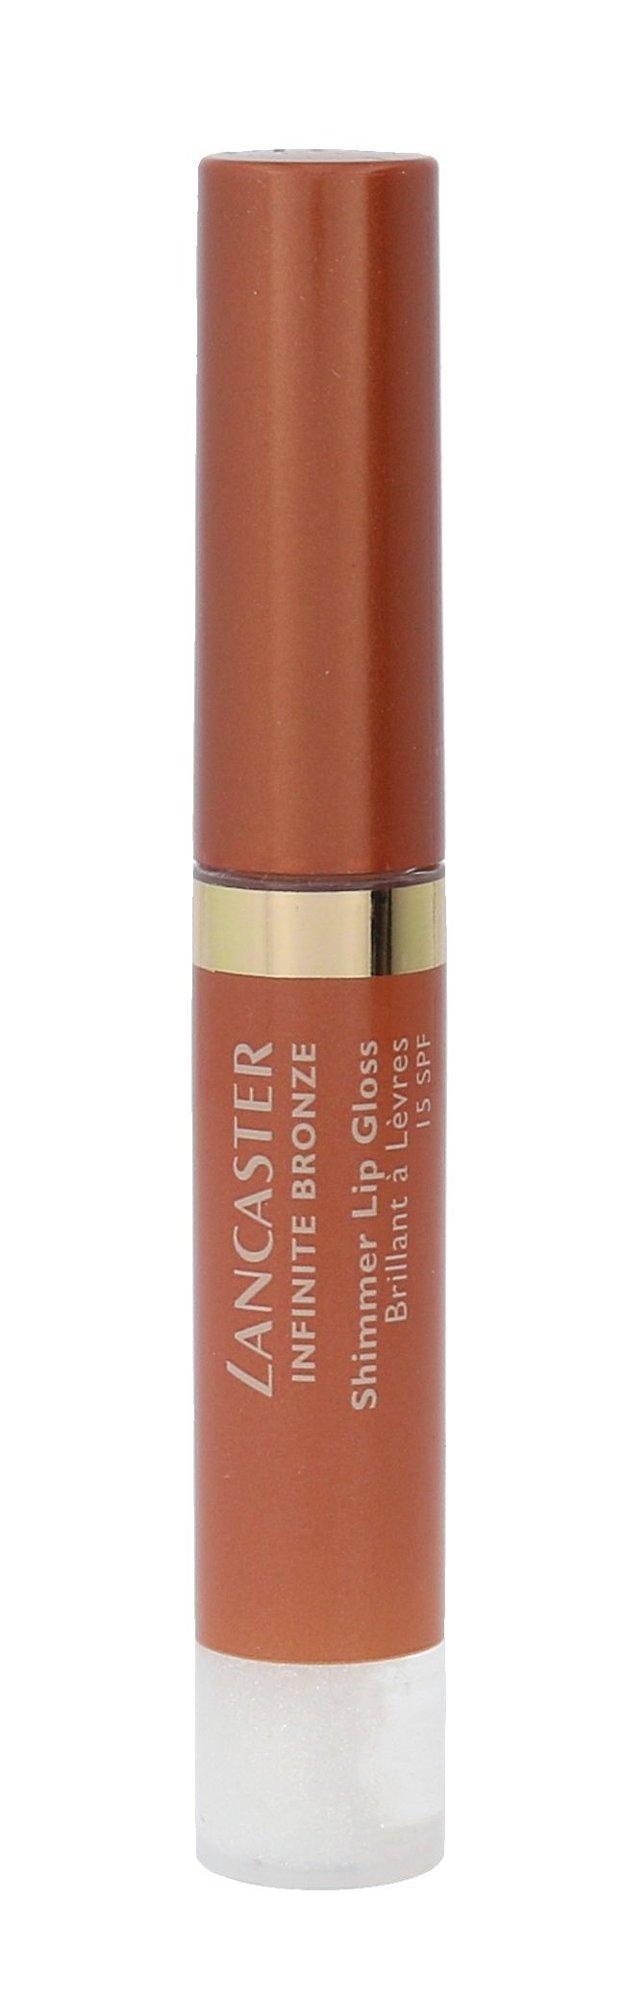 Lancaster Infinite Bronze Cosmetic 8ml 105 White